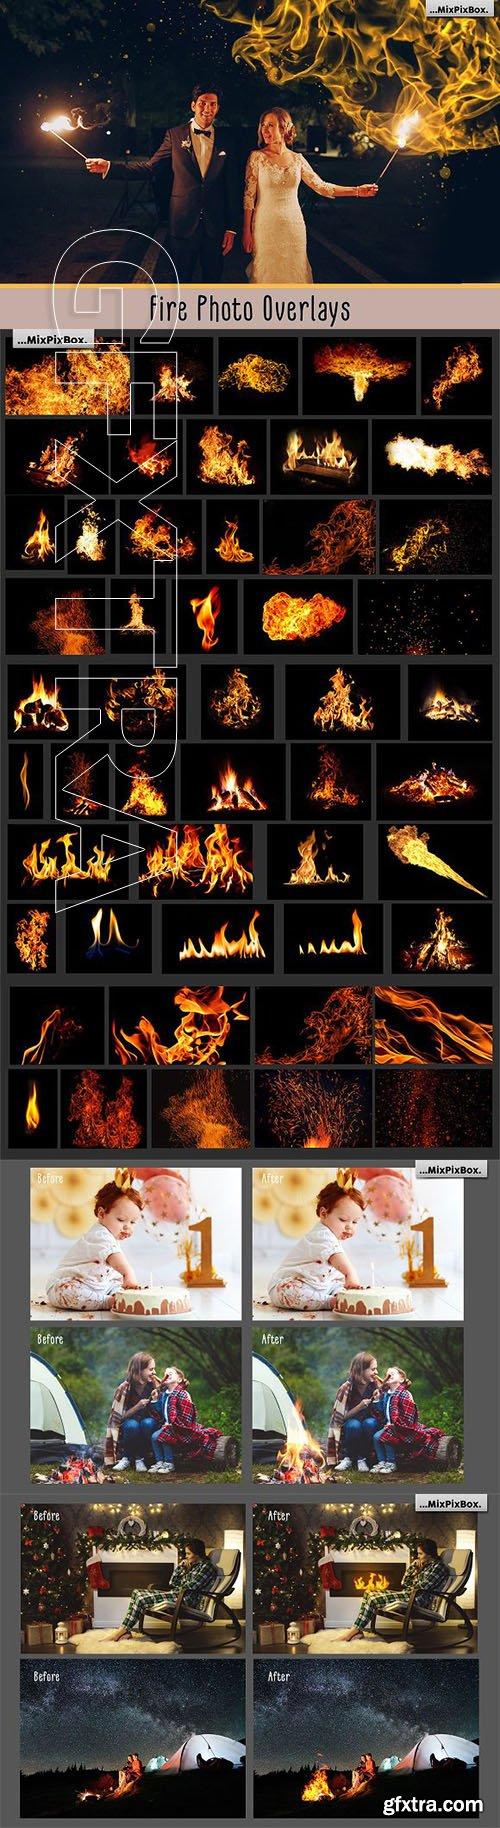 Fire Photo Overlays